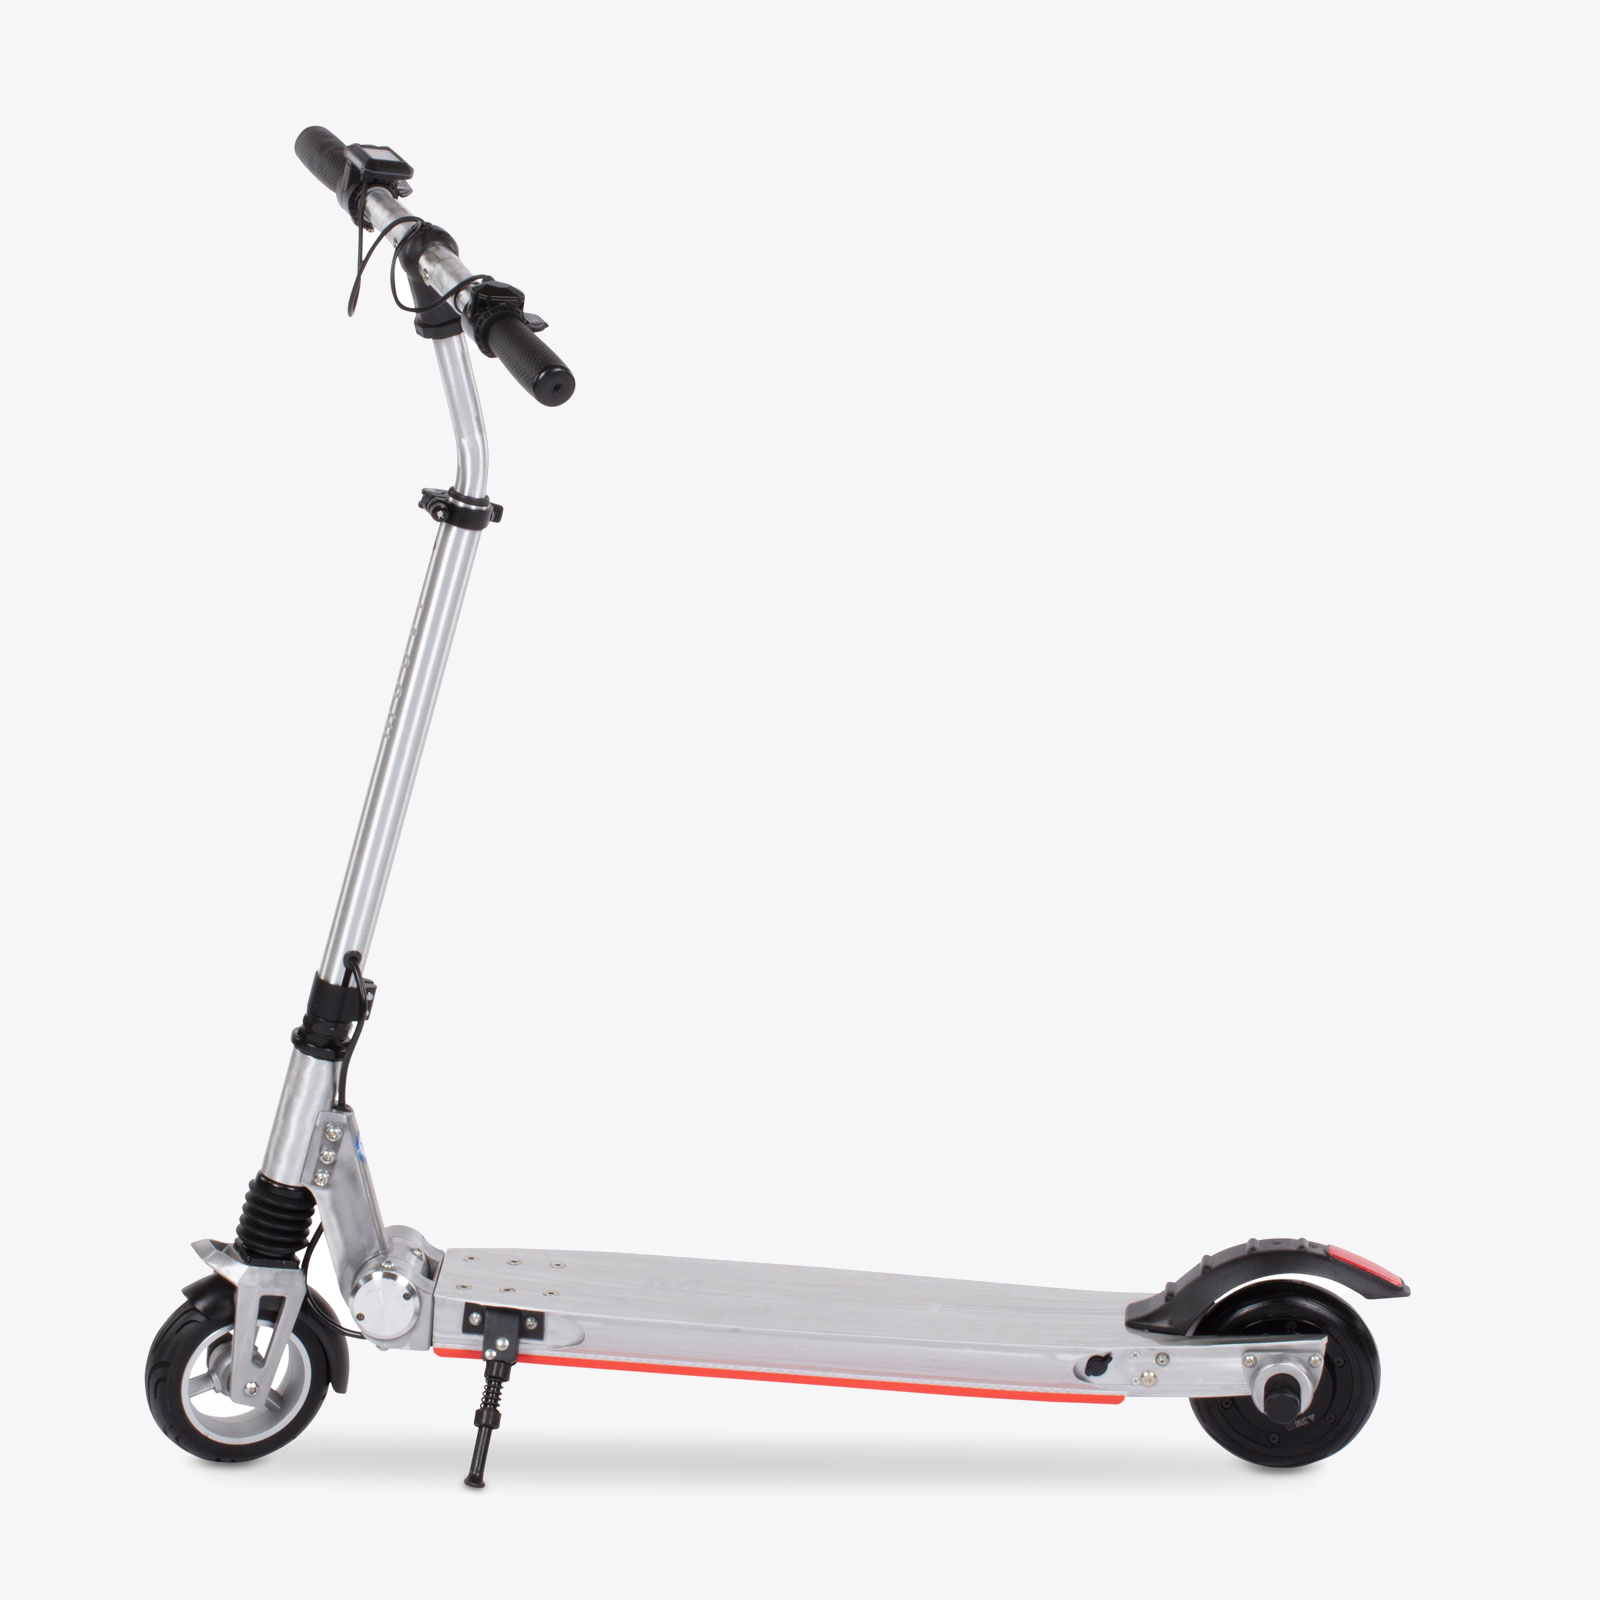 moovi-escooter-silber-seite-staender